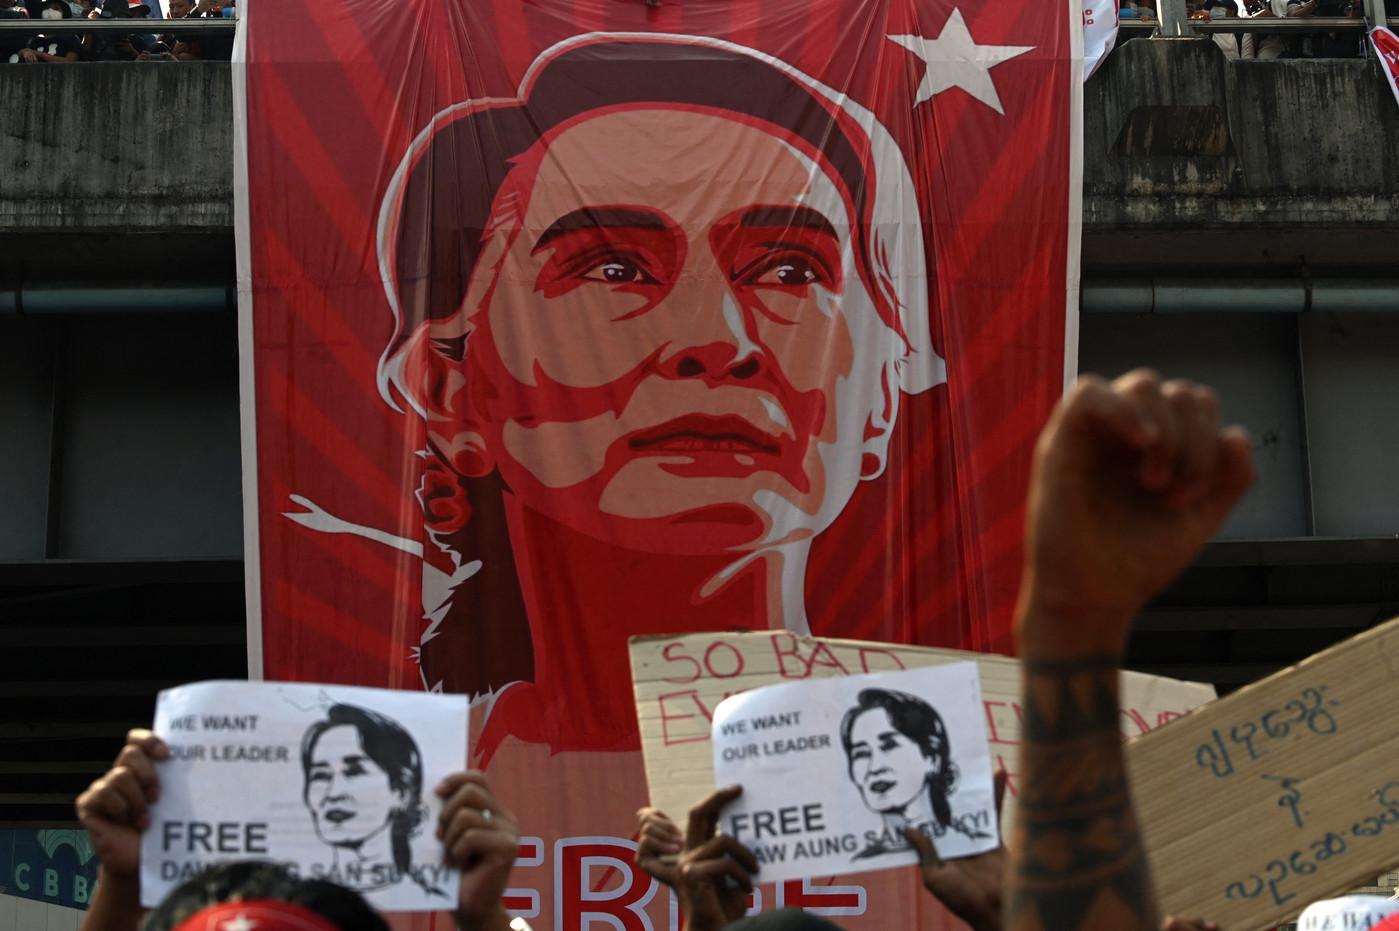 manifestants-demandent-liberation-retour-Aung-San-Suu-Kyi-9-fevrier-2021-Yangon-Birmanie_0_1399_931